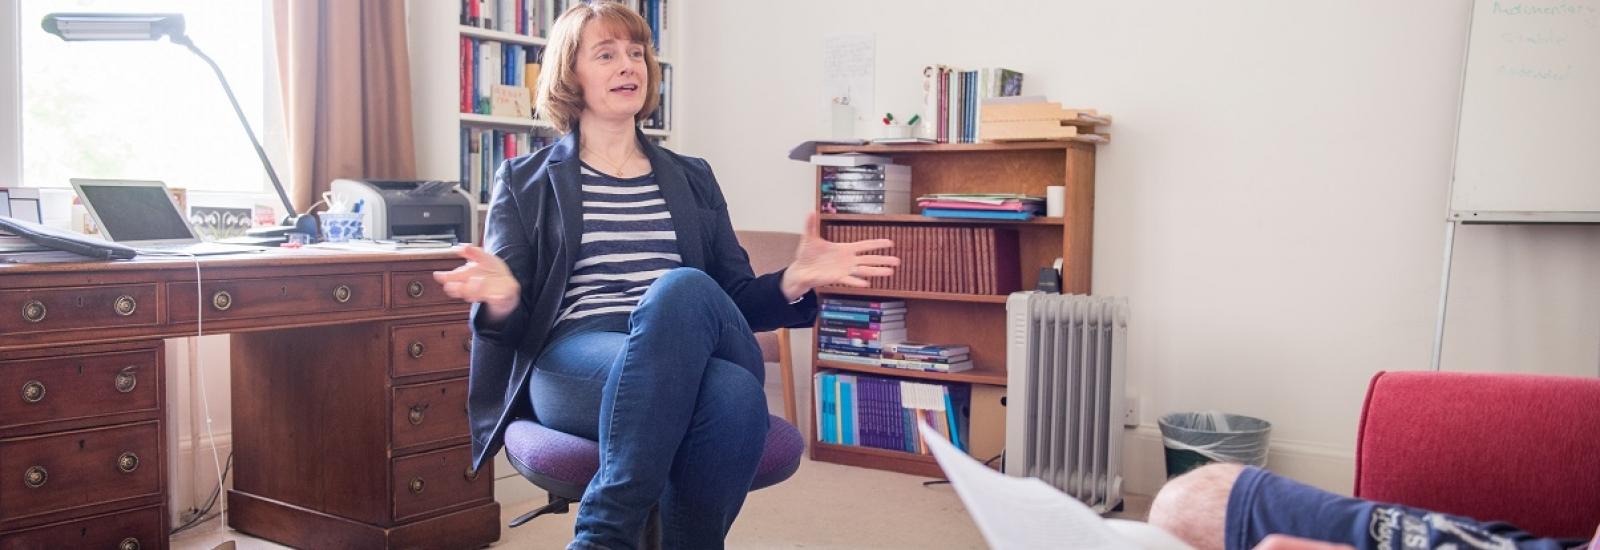 Tutorial with Dr Kerstin Hoge